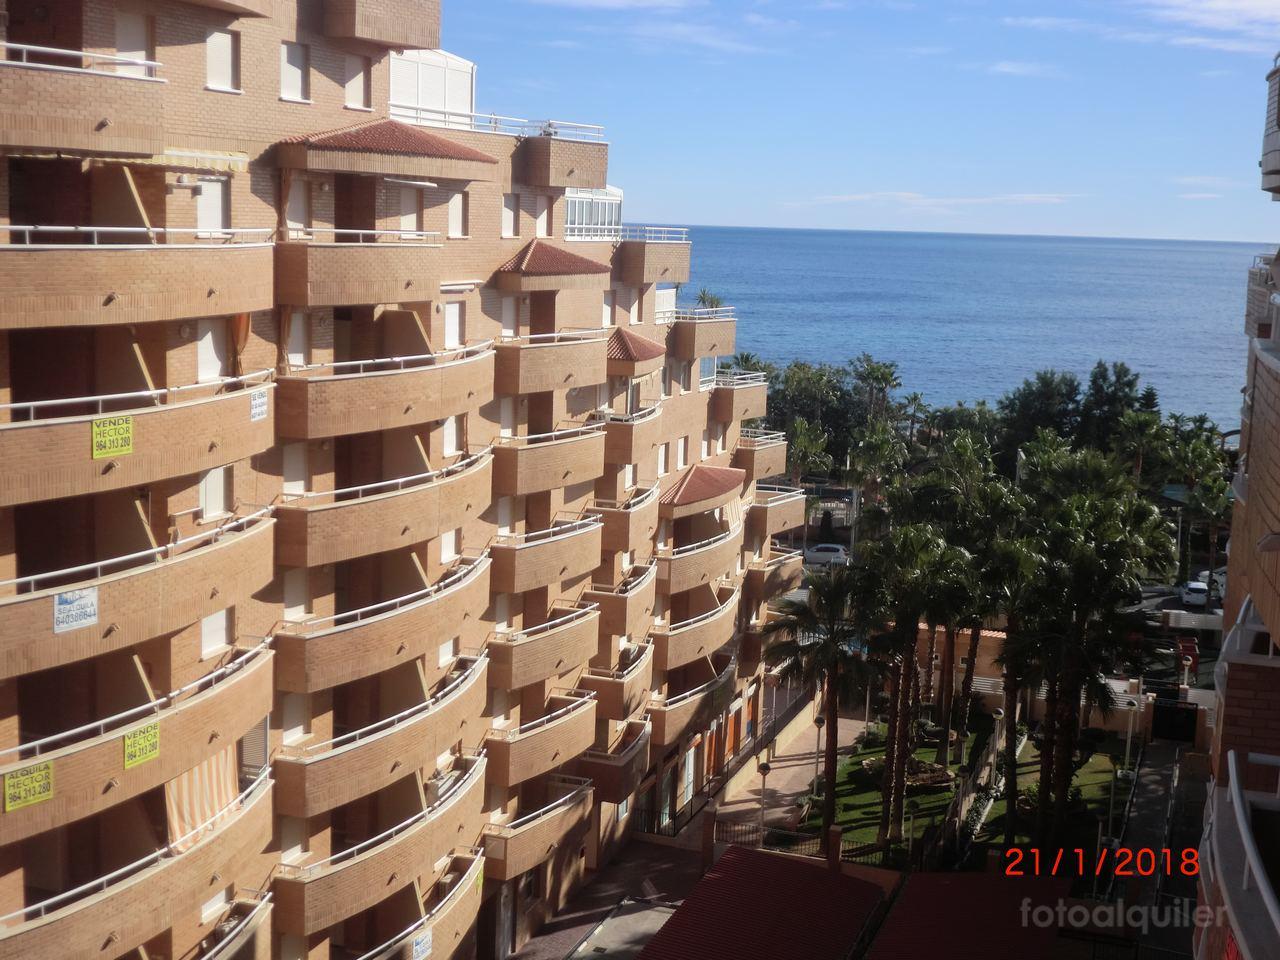 Alquiler de apartamento en primera línea de playa en Oropesa de Mar, Urbanización Marina D´Or, Castellón, ref.: v62